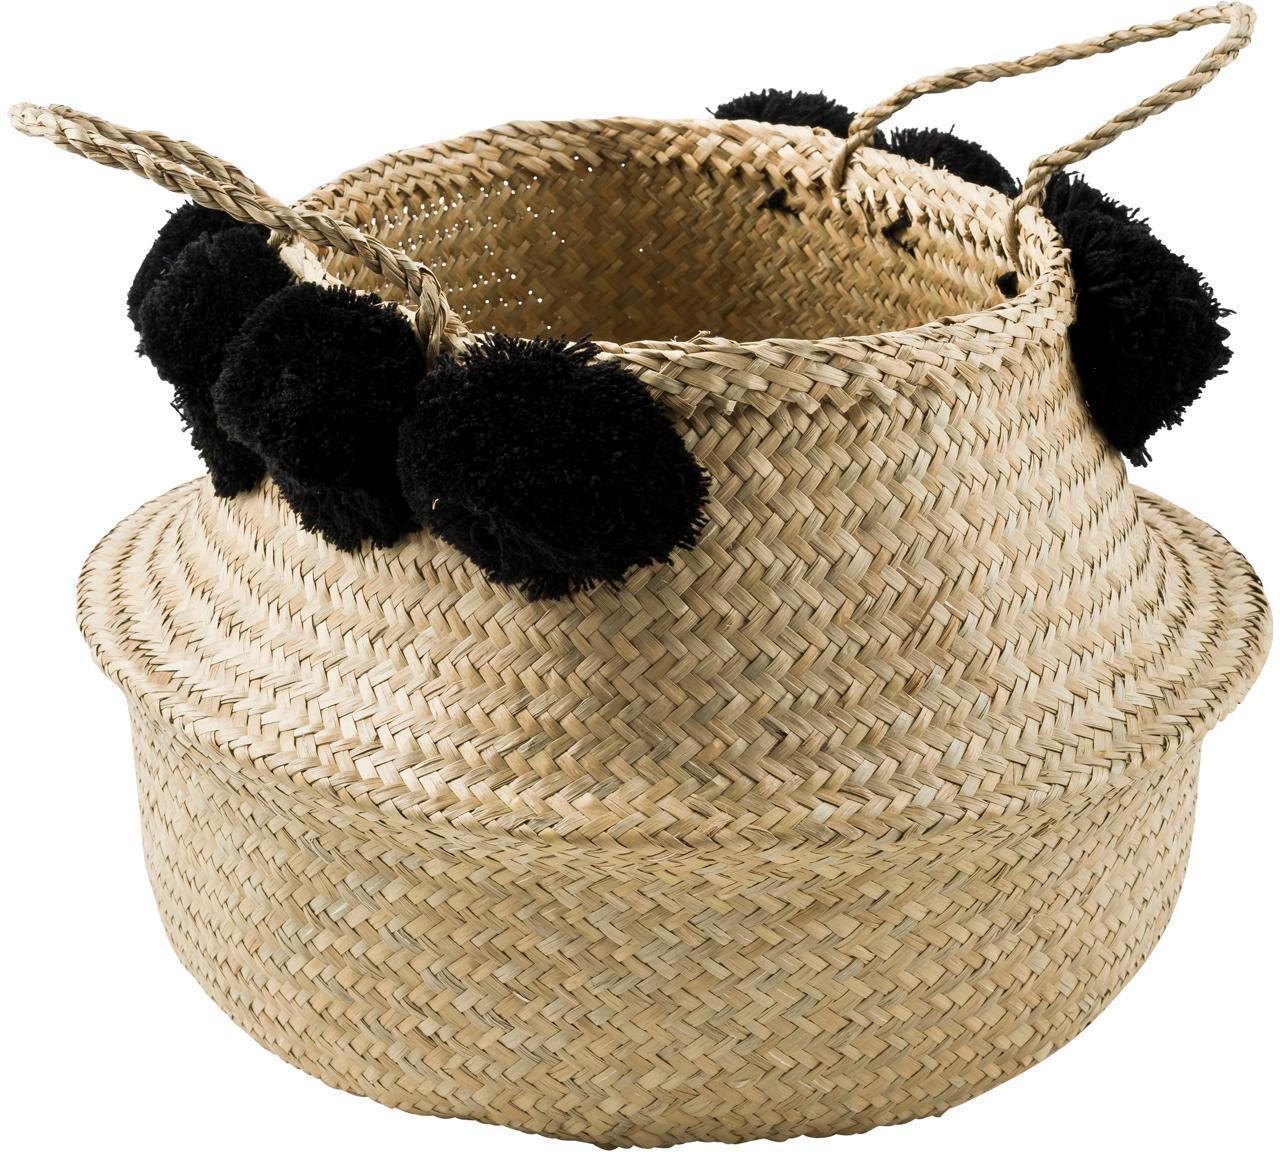 Cesta artesanal Calypso, Seagrass, lana, Seagrass, negro, Ø 35 x Al 31 cm